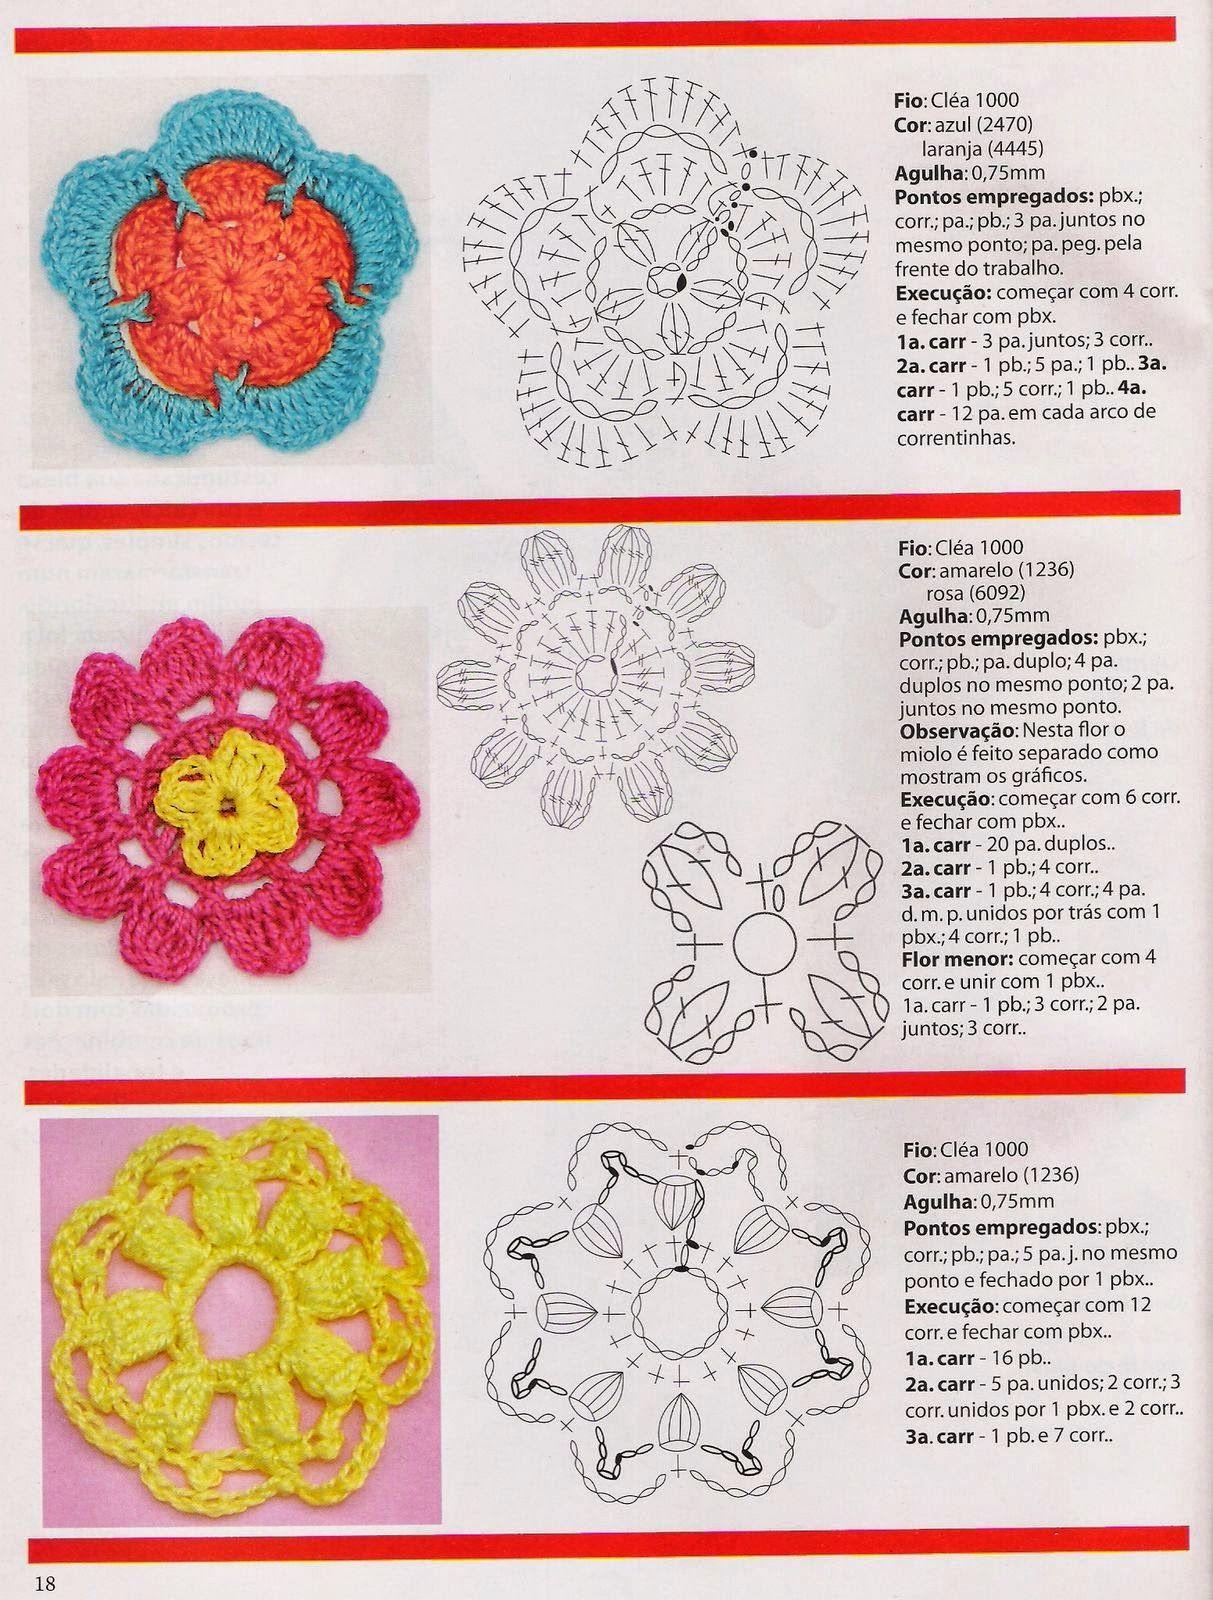 revistas de manualidades gratis | formas crochet | Pinterest ...